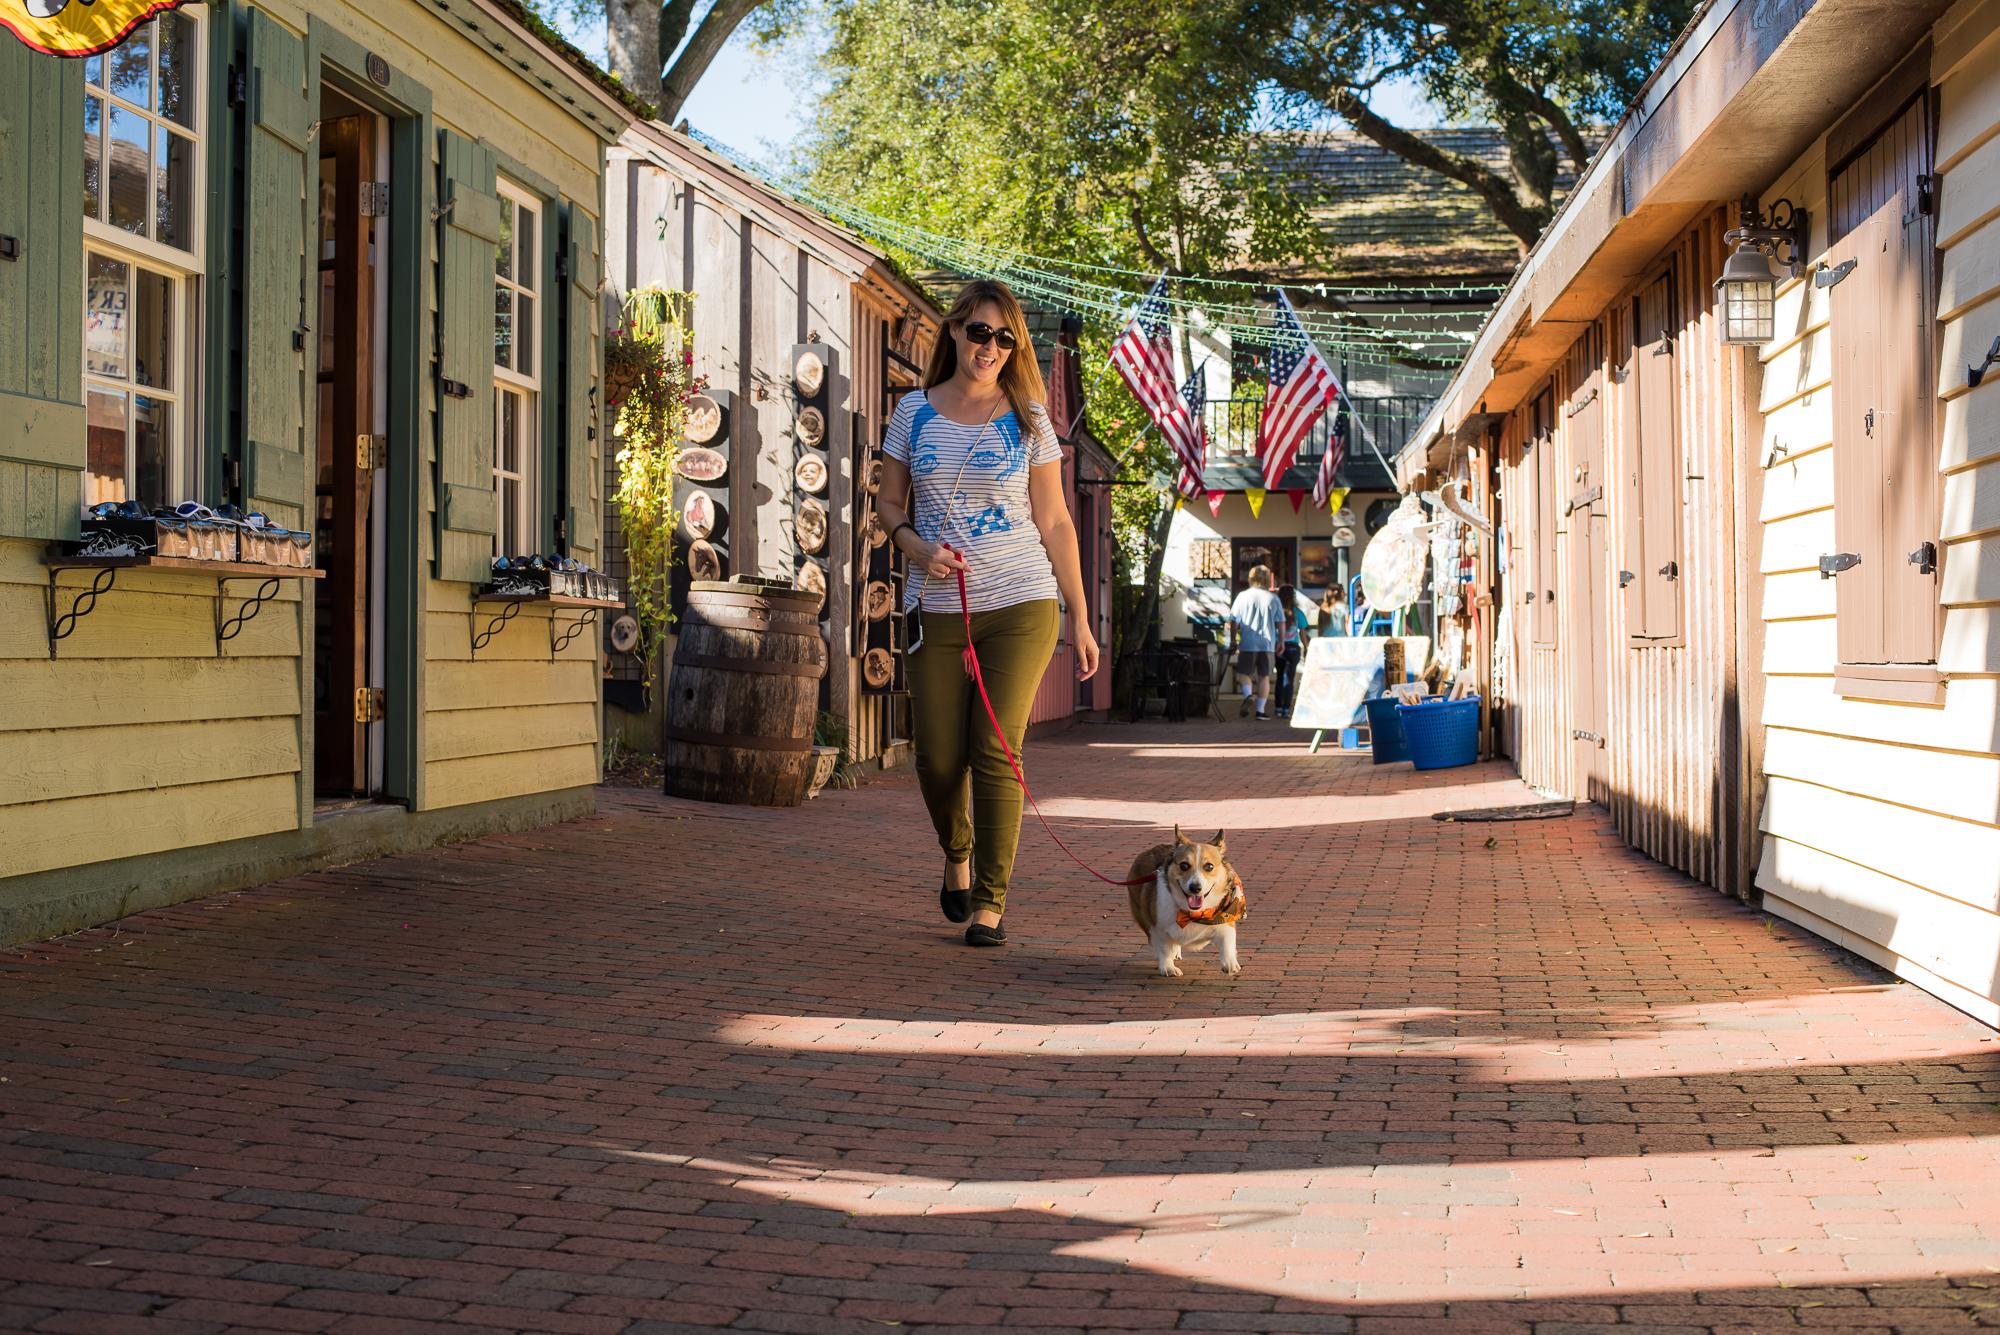 Taking a stroll around historic St. Augustine with Kuma